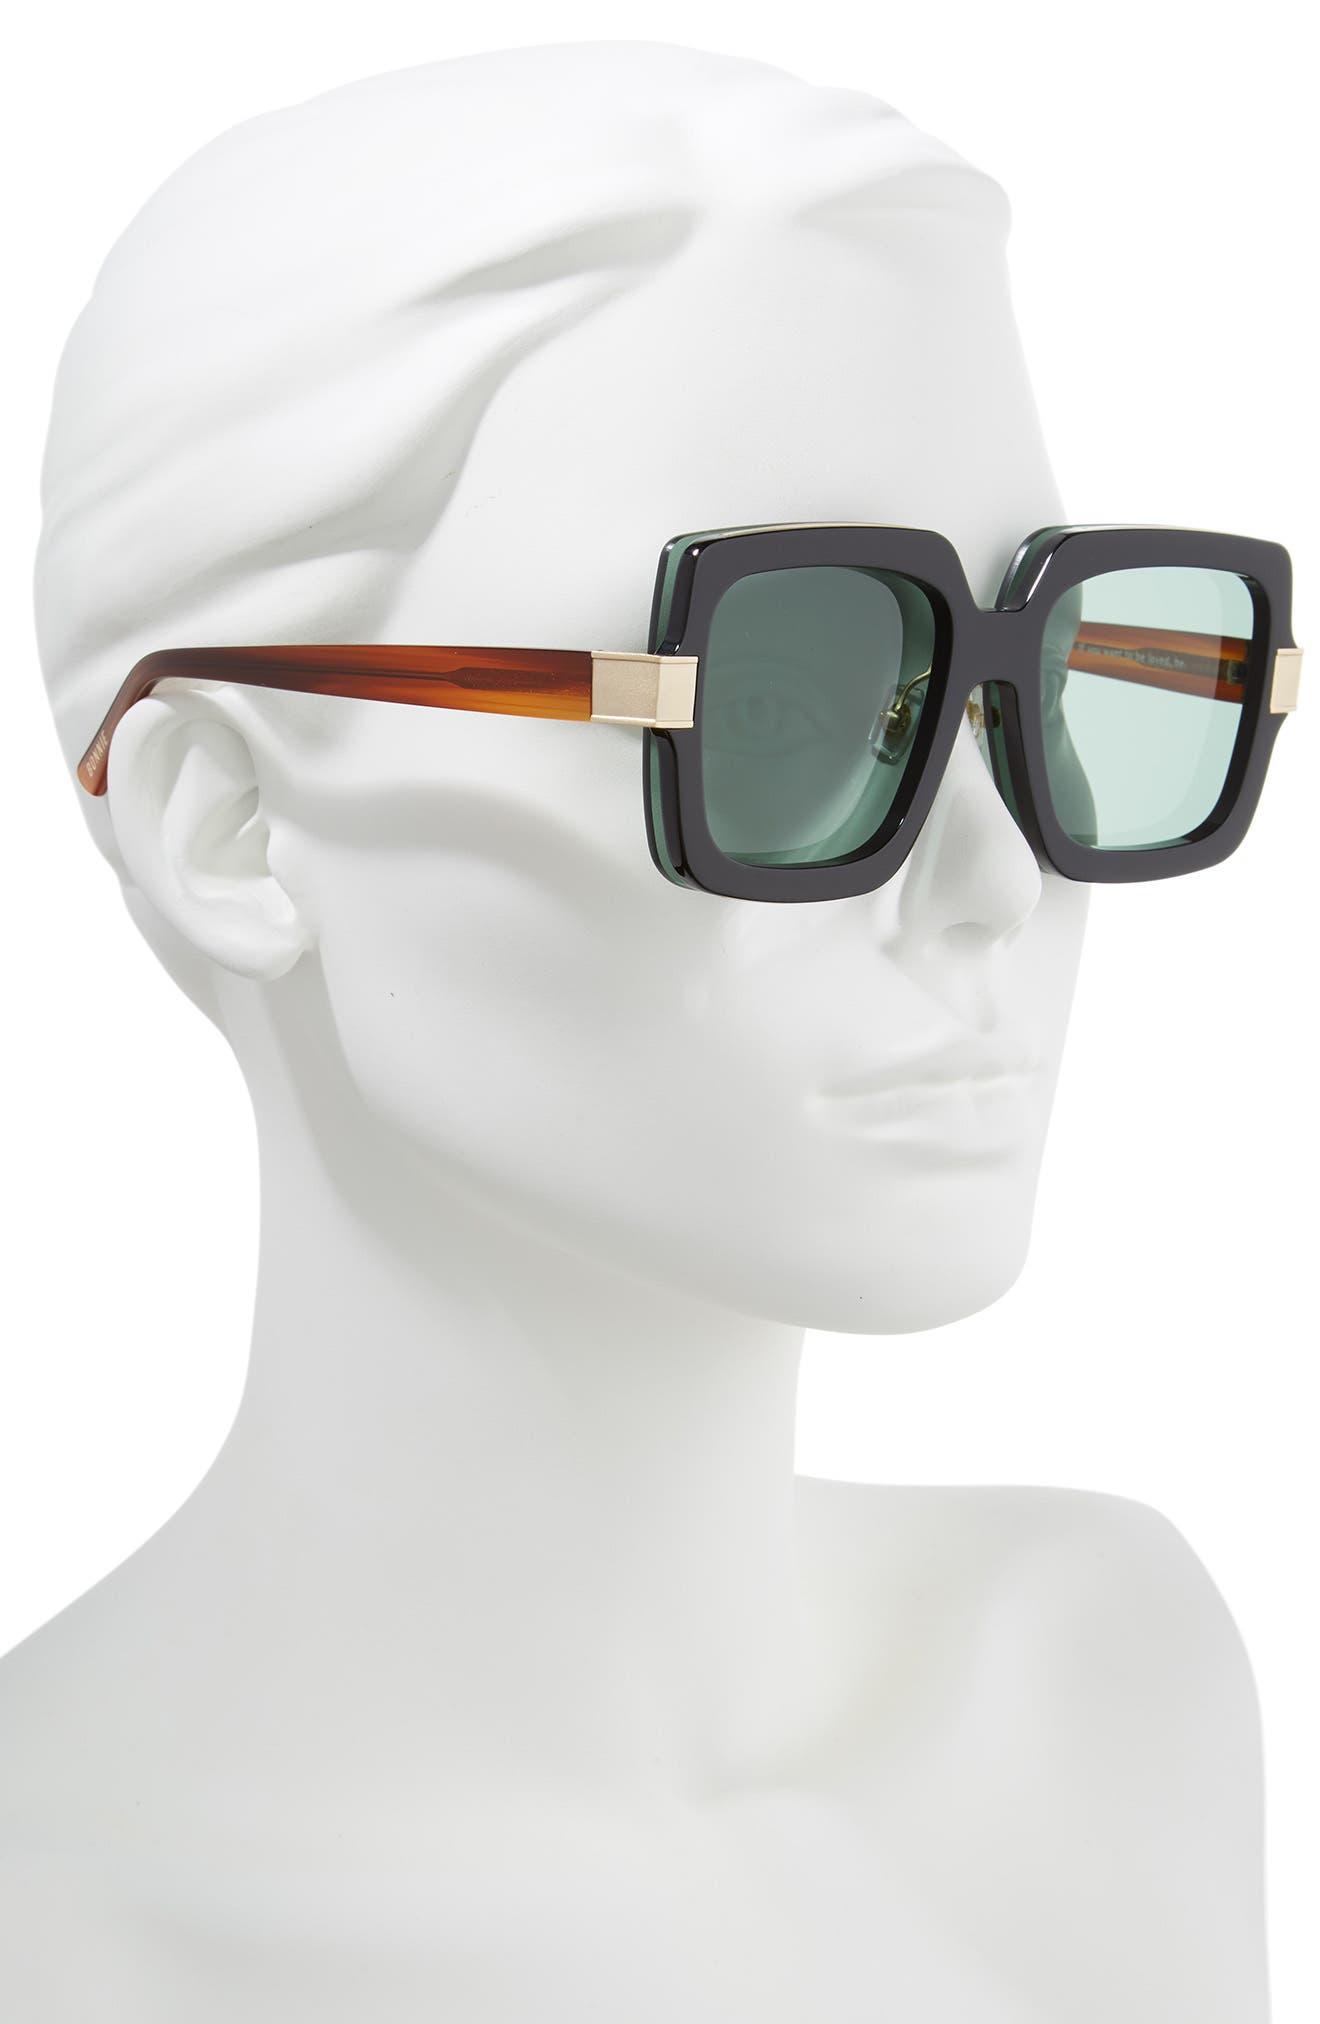 Mancuso 54mm Sunglasses,                             Alternate thumbnail 2, color,                             001